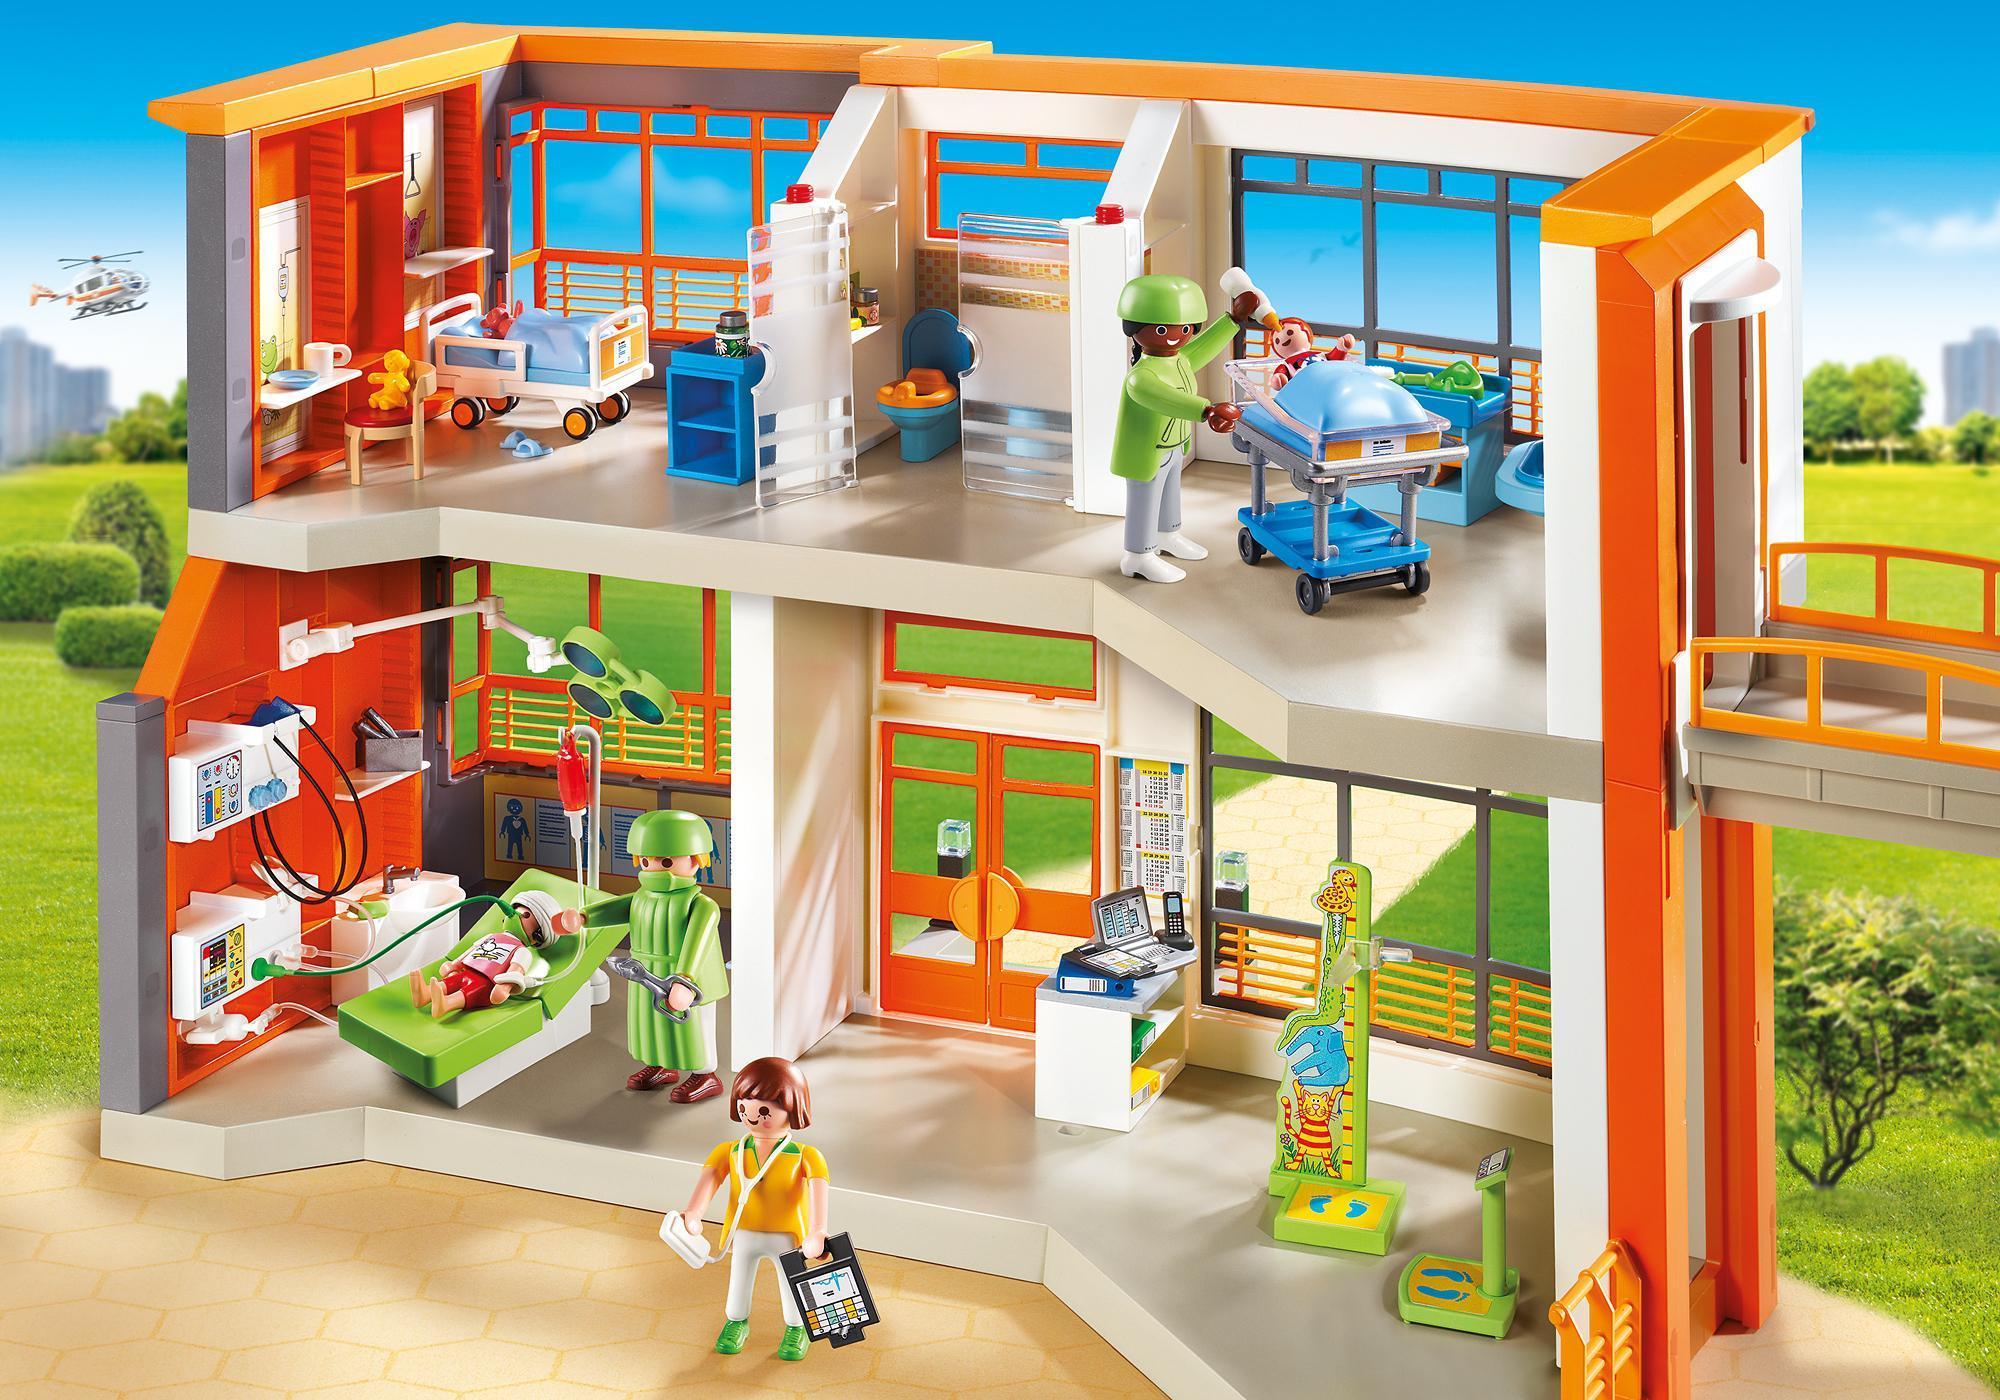 http://media.playmobil.com/i/playmobil/6657_product_detail